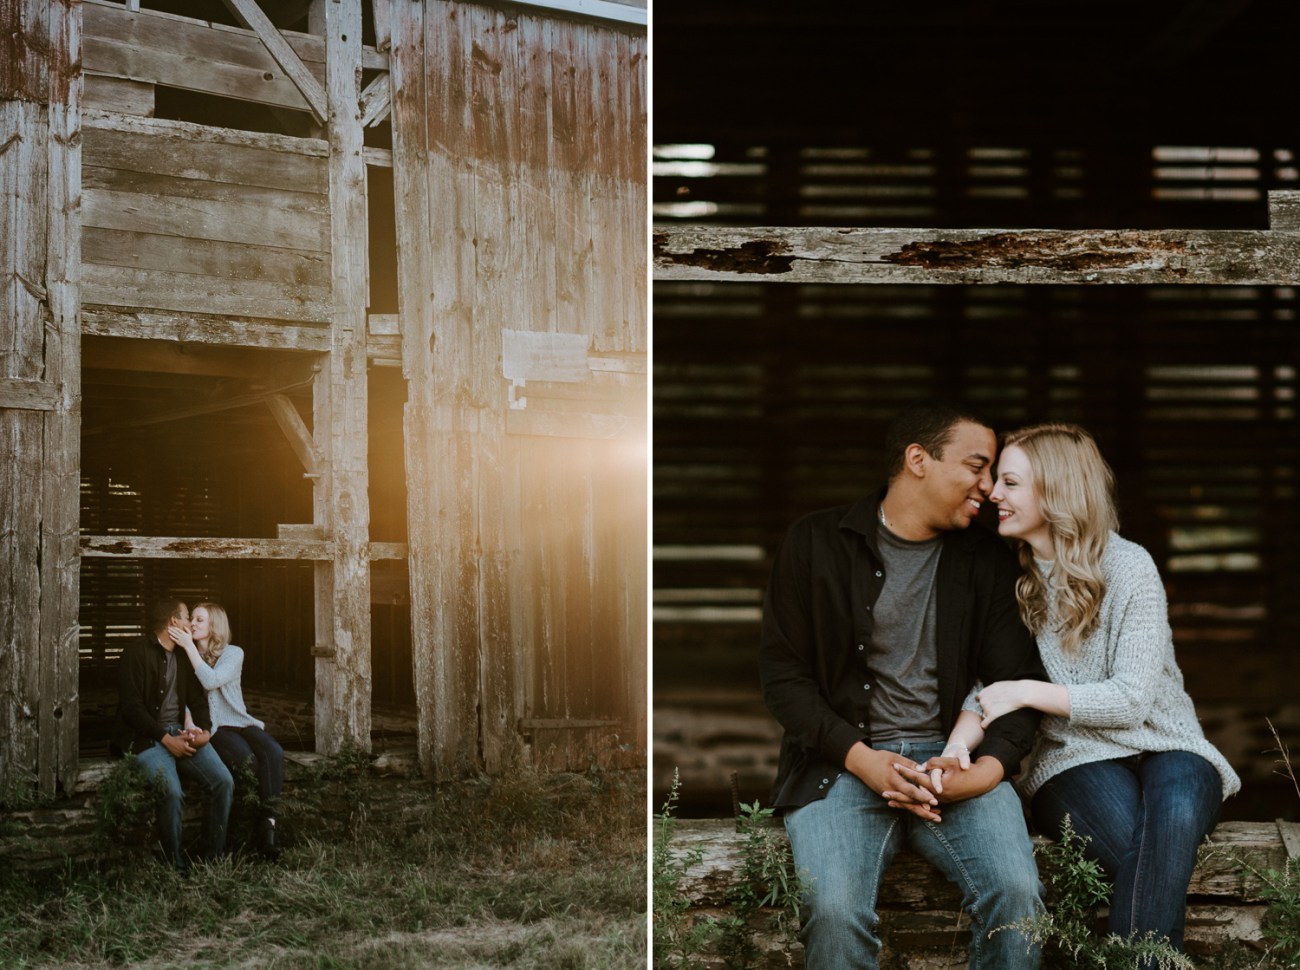 New Jersey Barn Engagement Session Branchburg New Jersey Anais Possamai Photography New Jersey Wedding Photographer